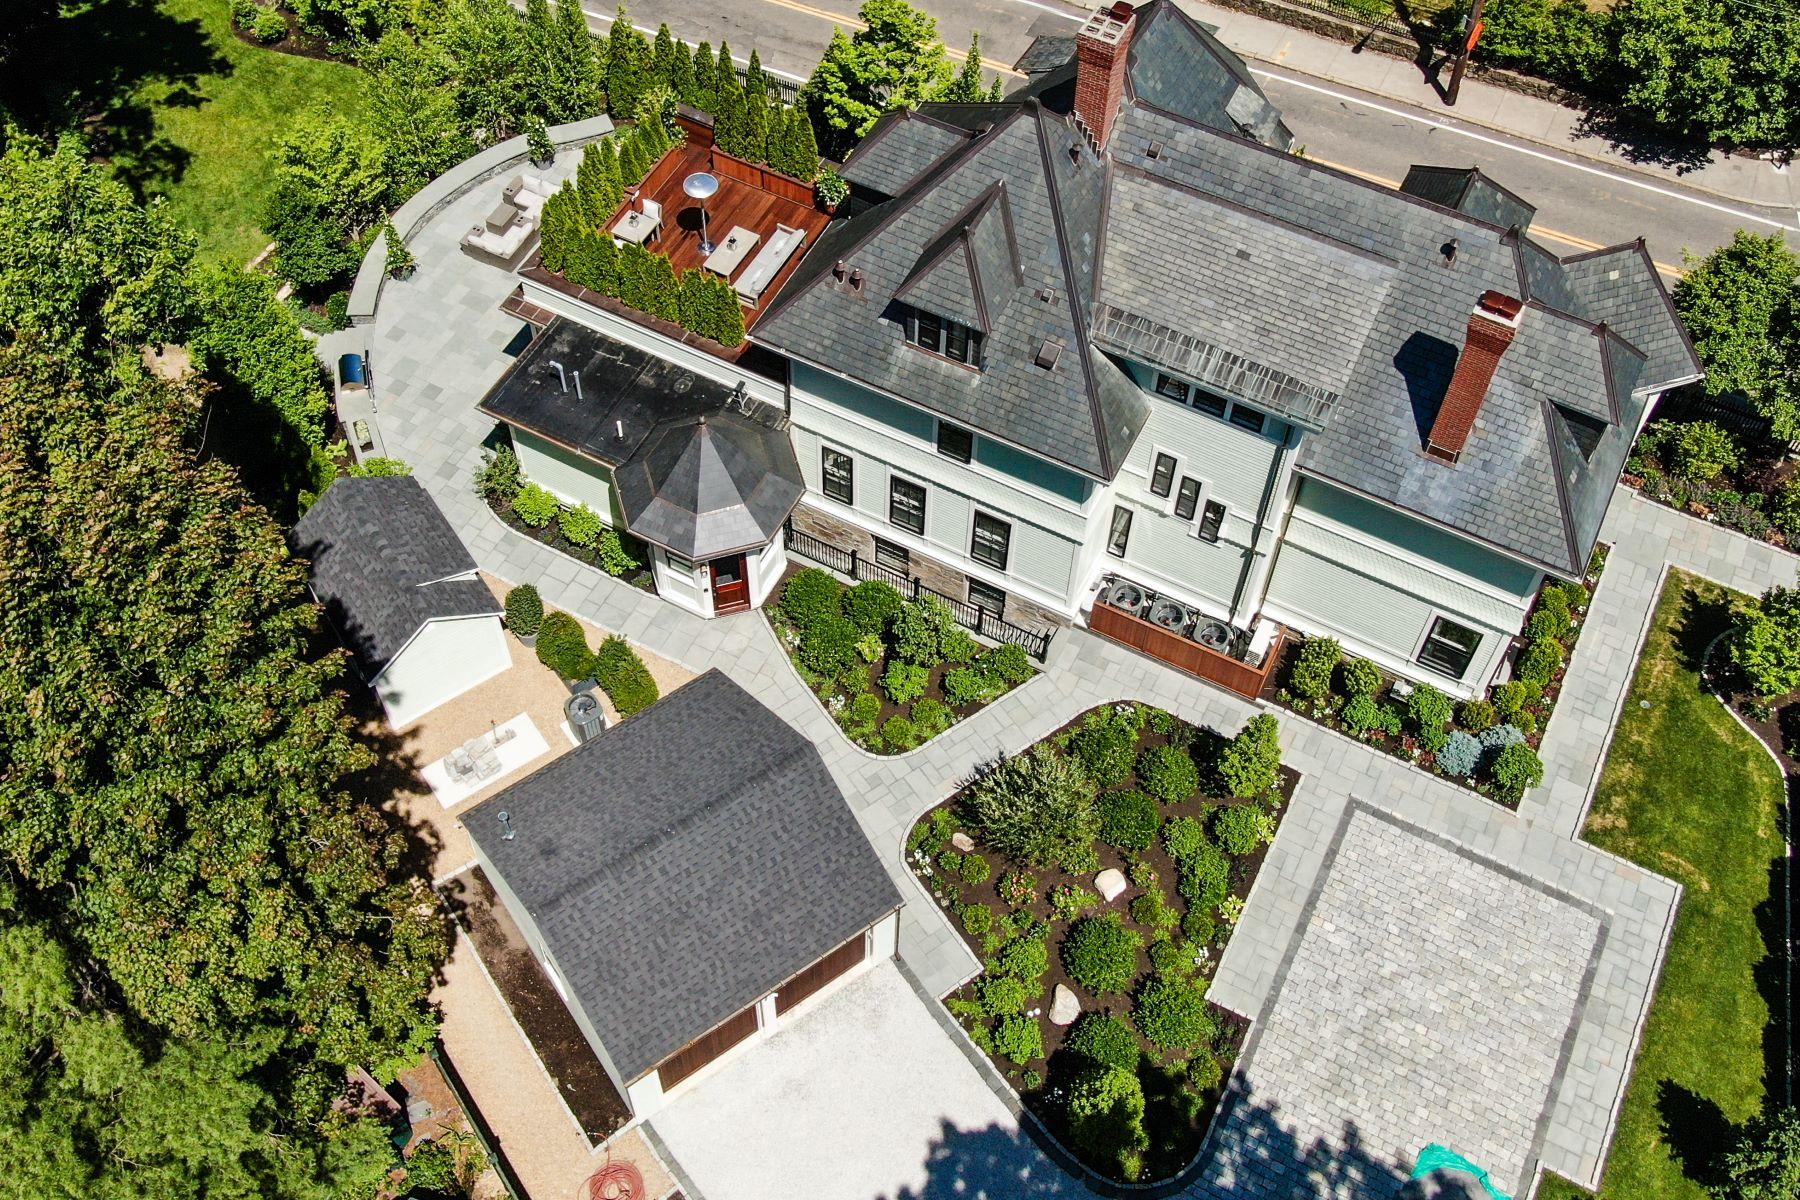 Single Family Homes για την Πώληση στο Brookline, Μασαχουσετη 02445 Ηνωμένες Πολιτείες